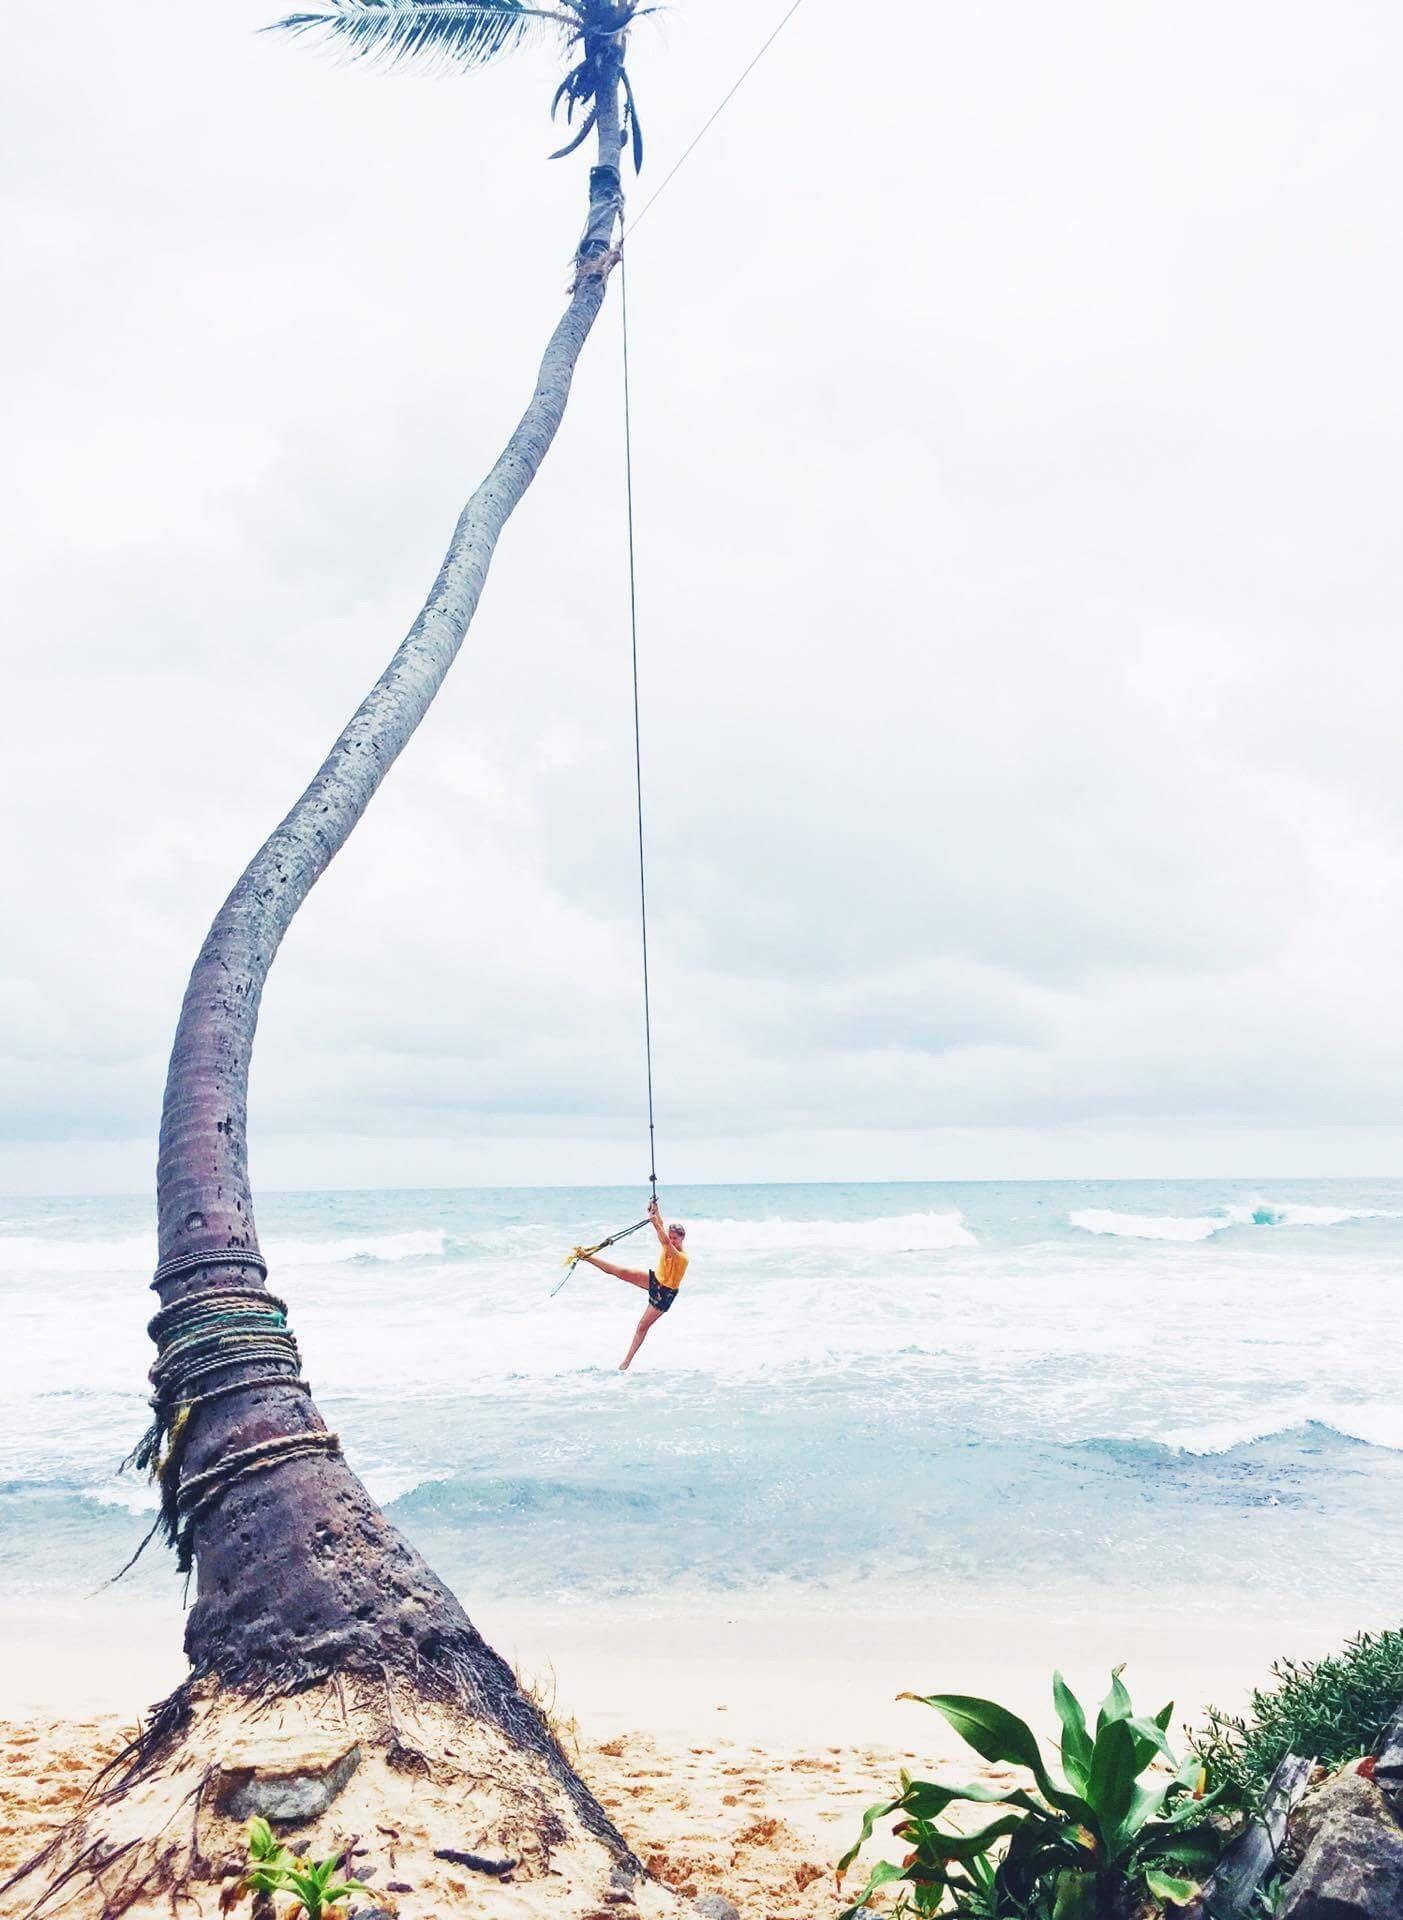 Reiskosten Sri Lanka: wat kan je verwachten?